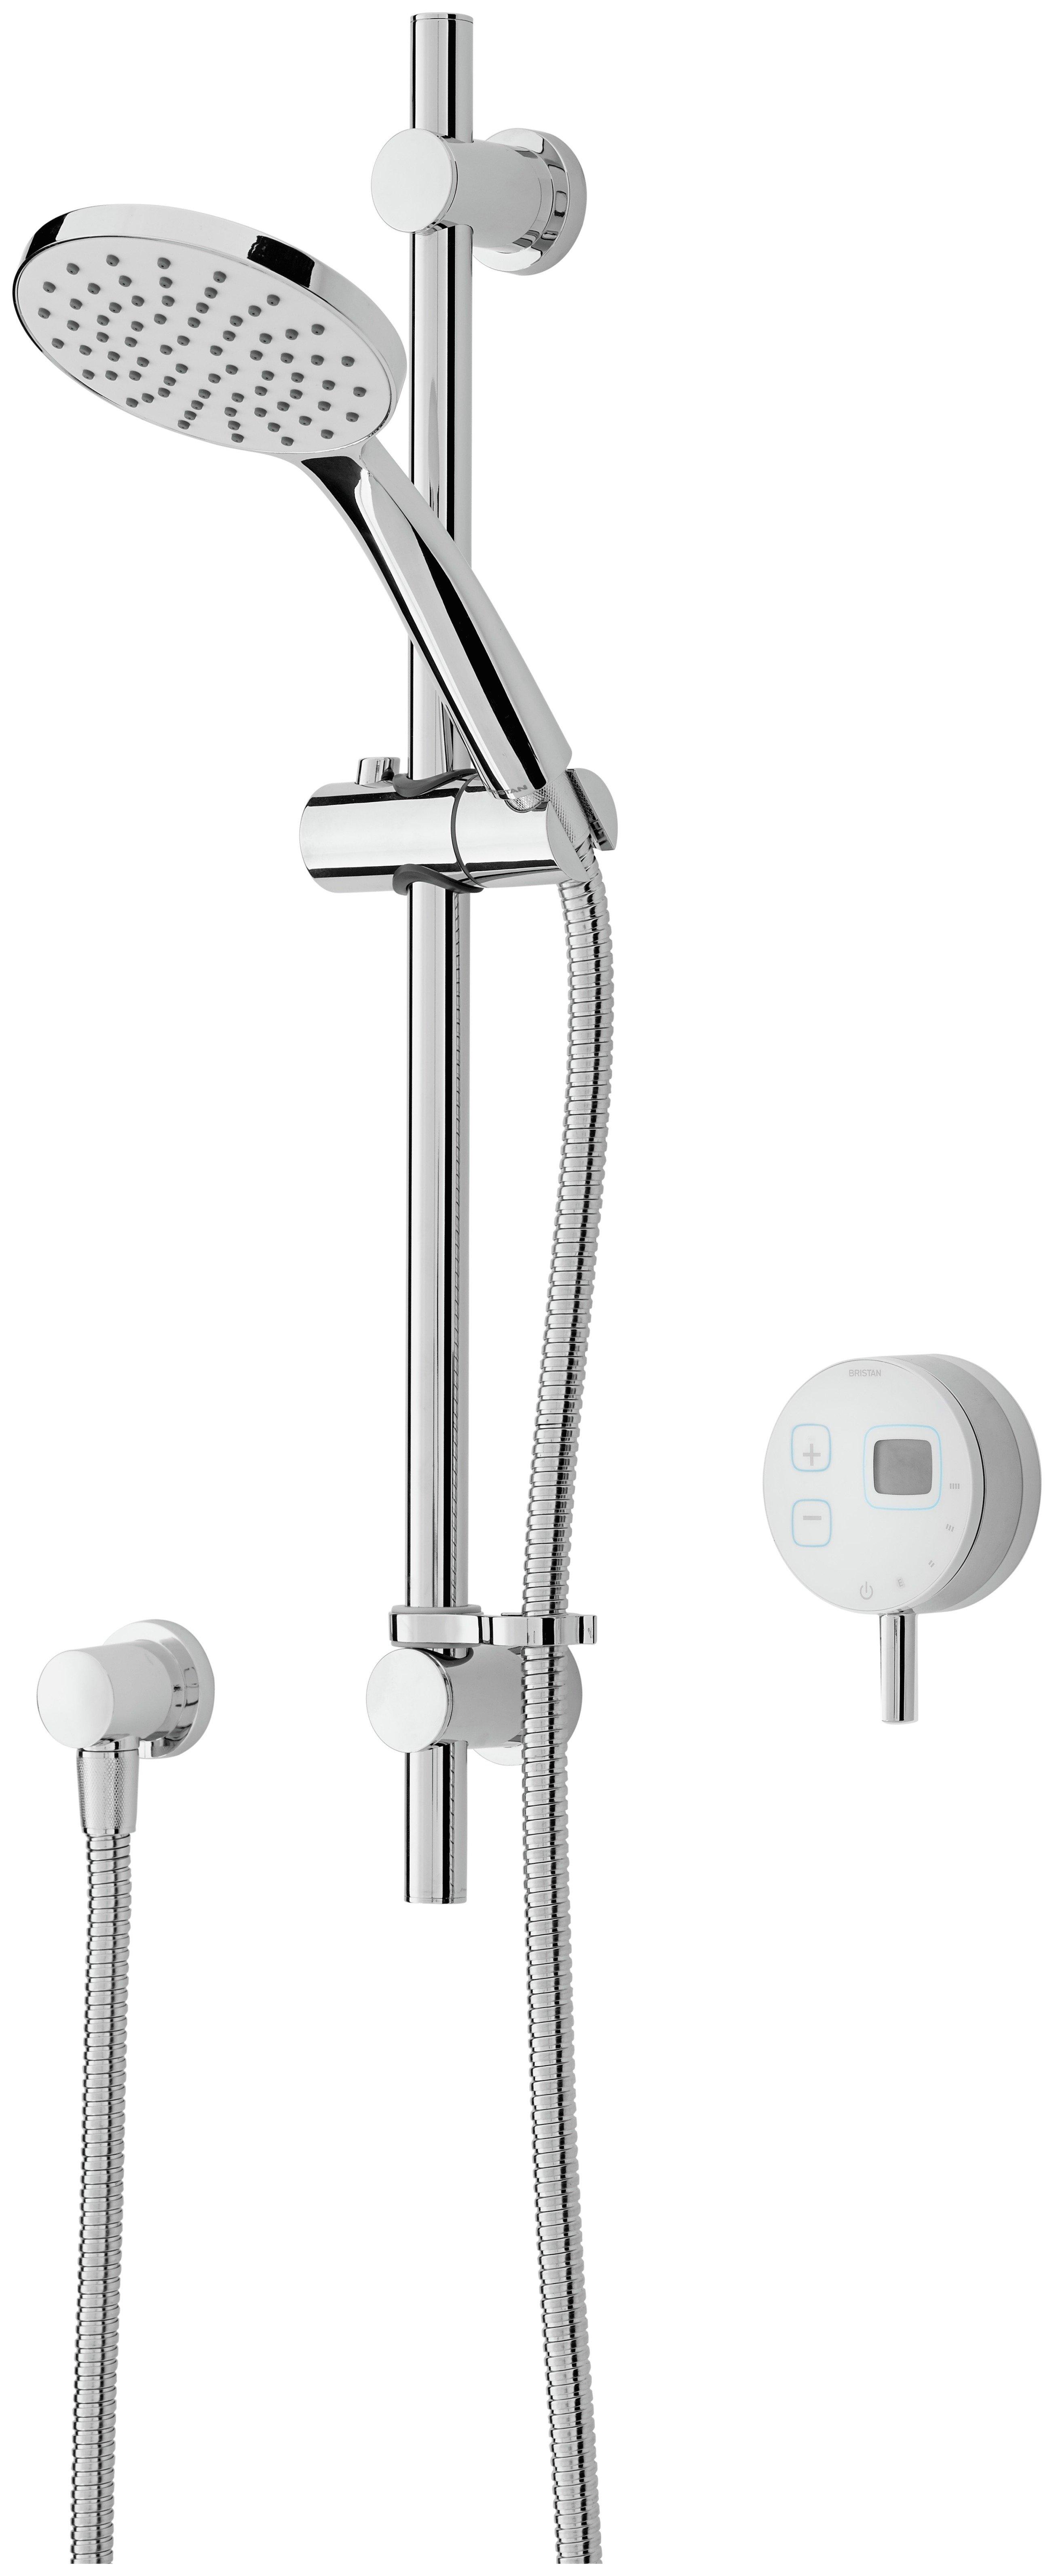 Image of Bristan Artisan Evo Digital Electronic Shower & Riser White